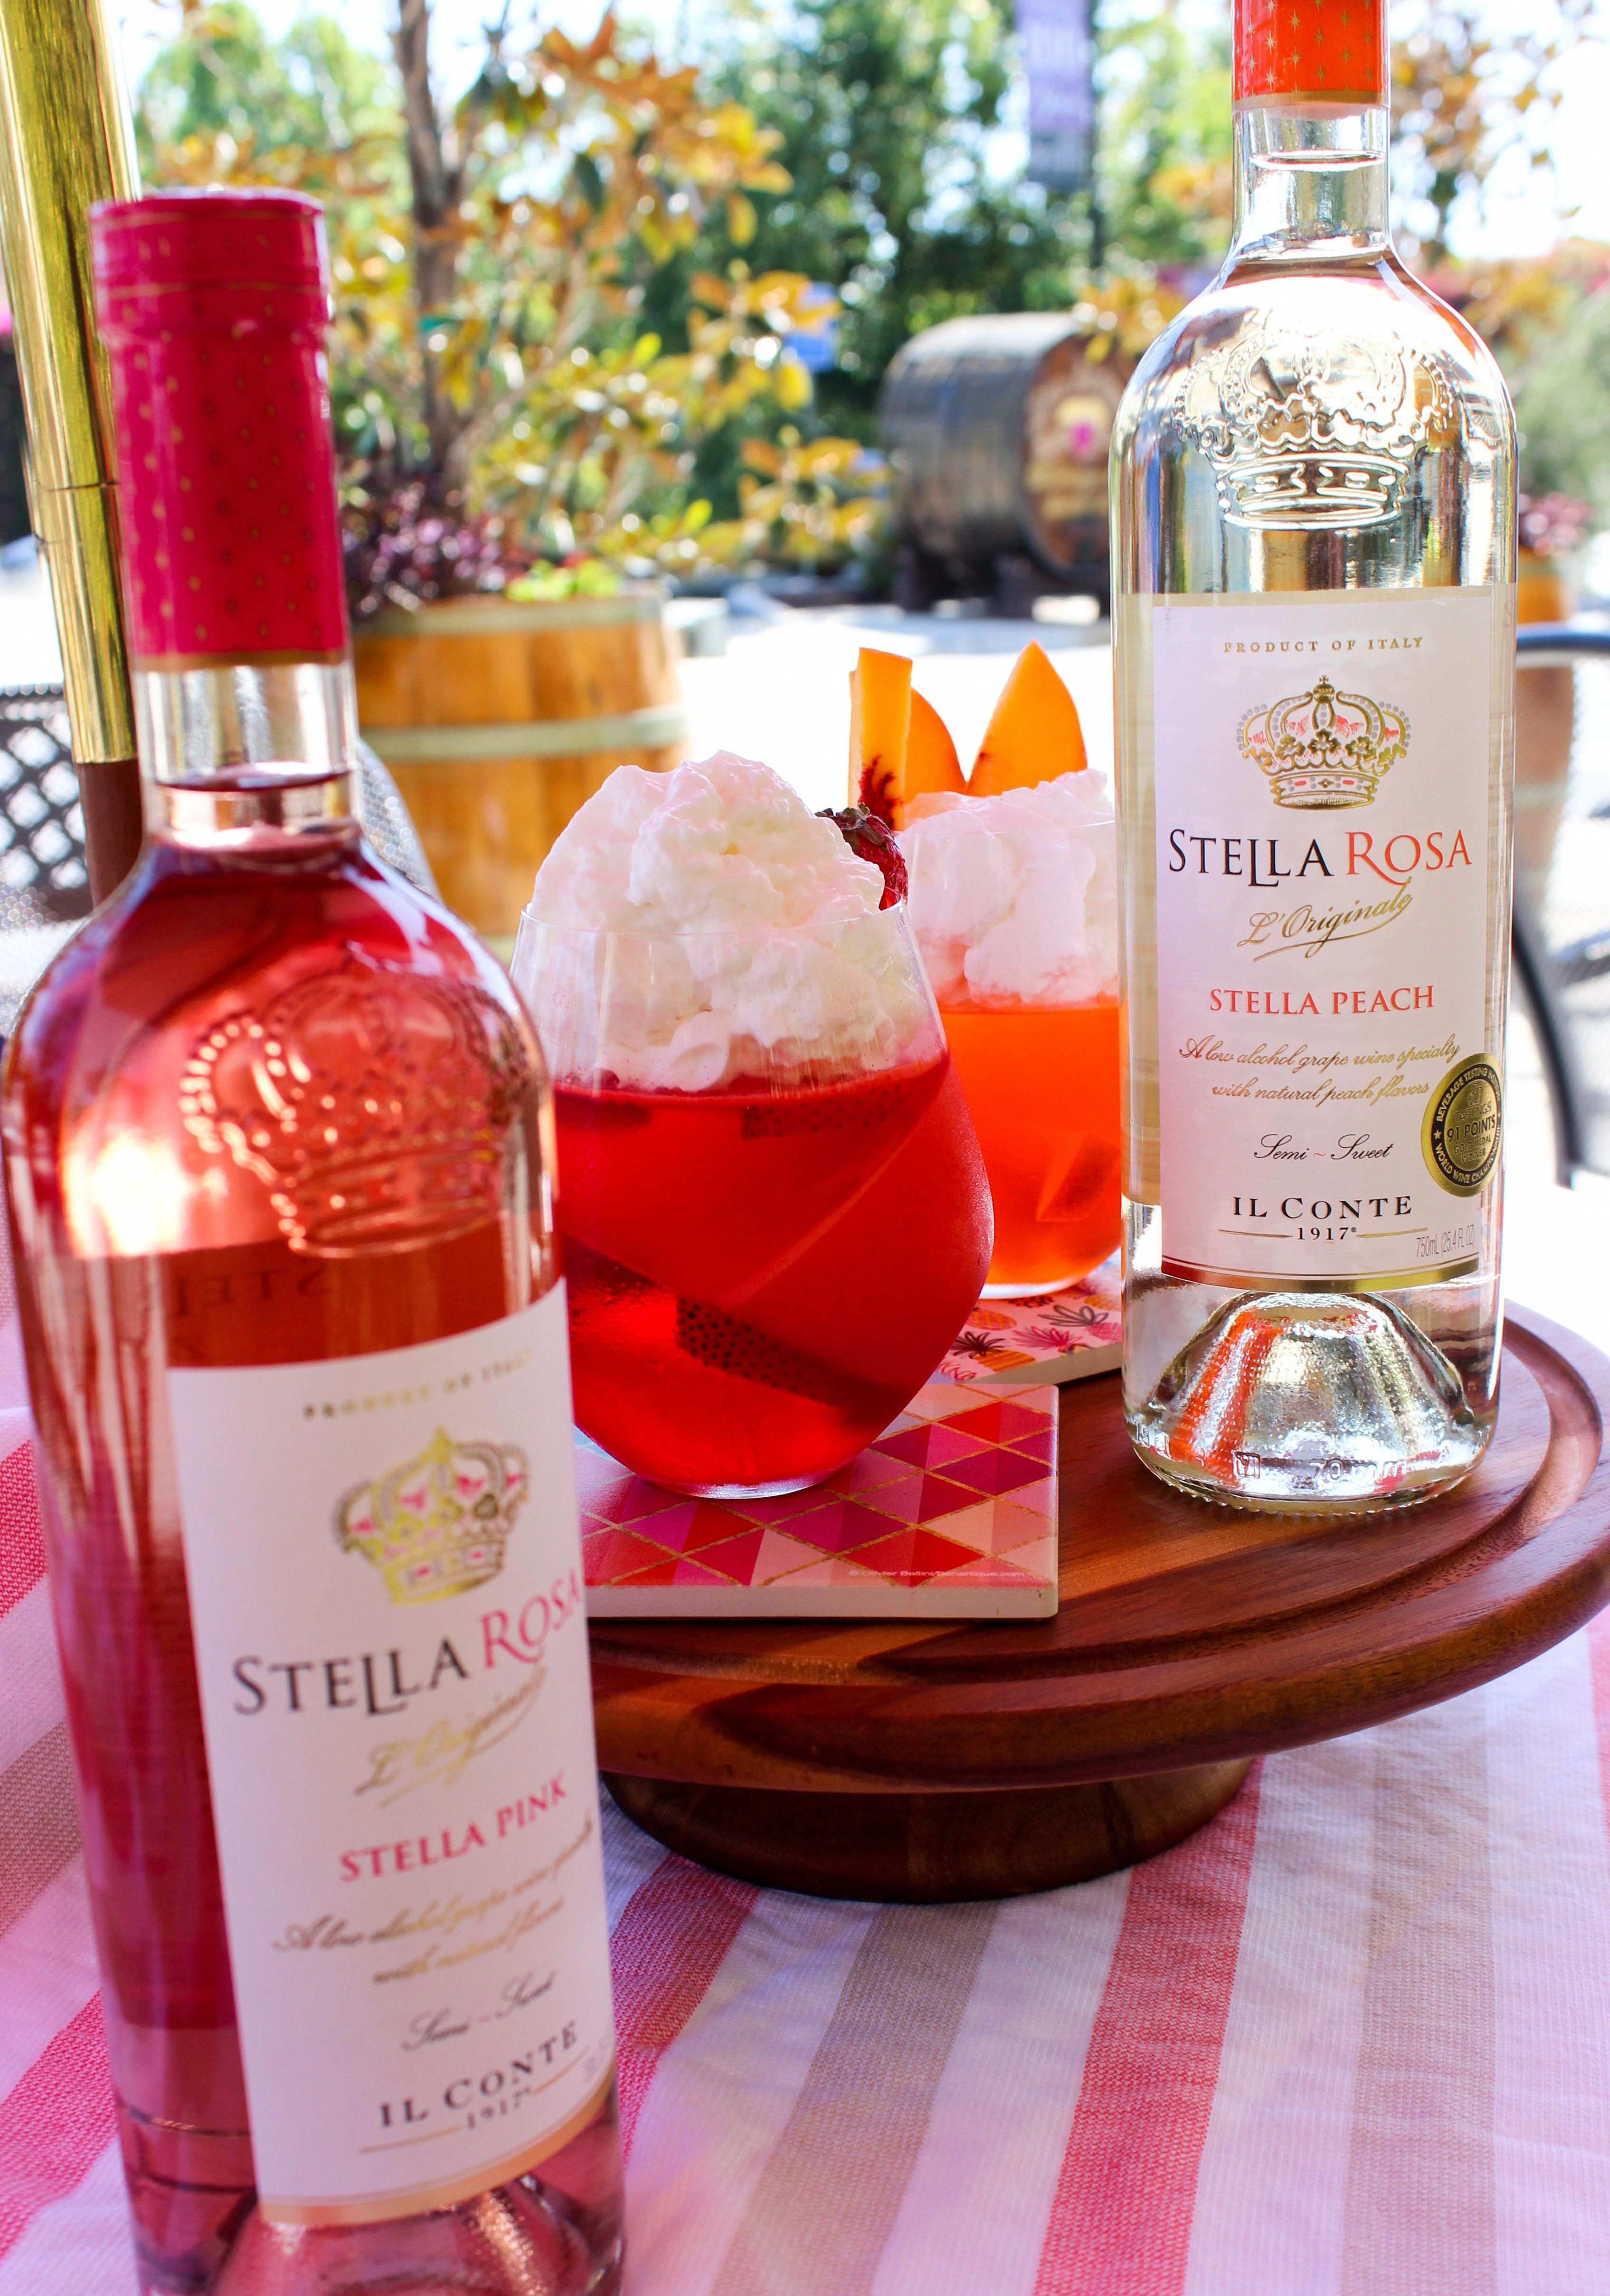 Shipping Wine To Pa 2winebottlegiftbag Key 2434945072 Pinotnoirwine Wine Infused Sweet Wine Stella Wine